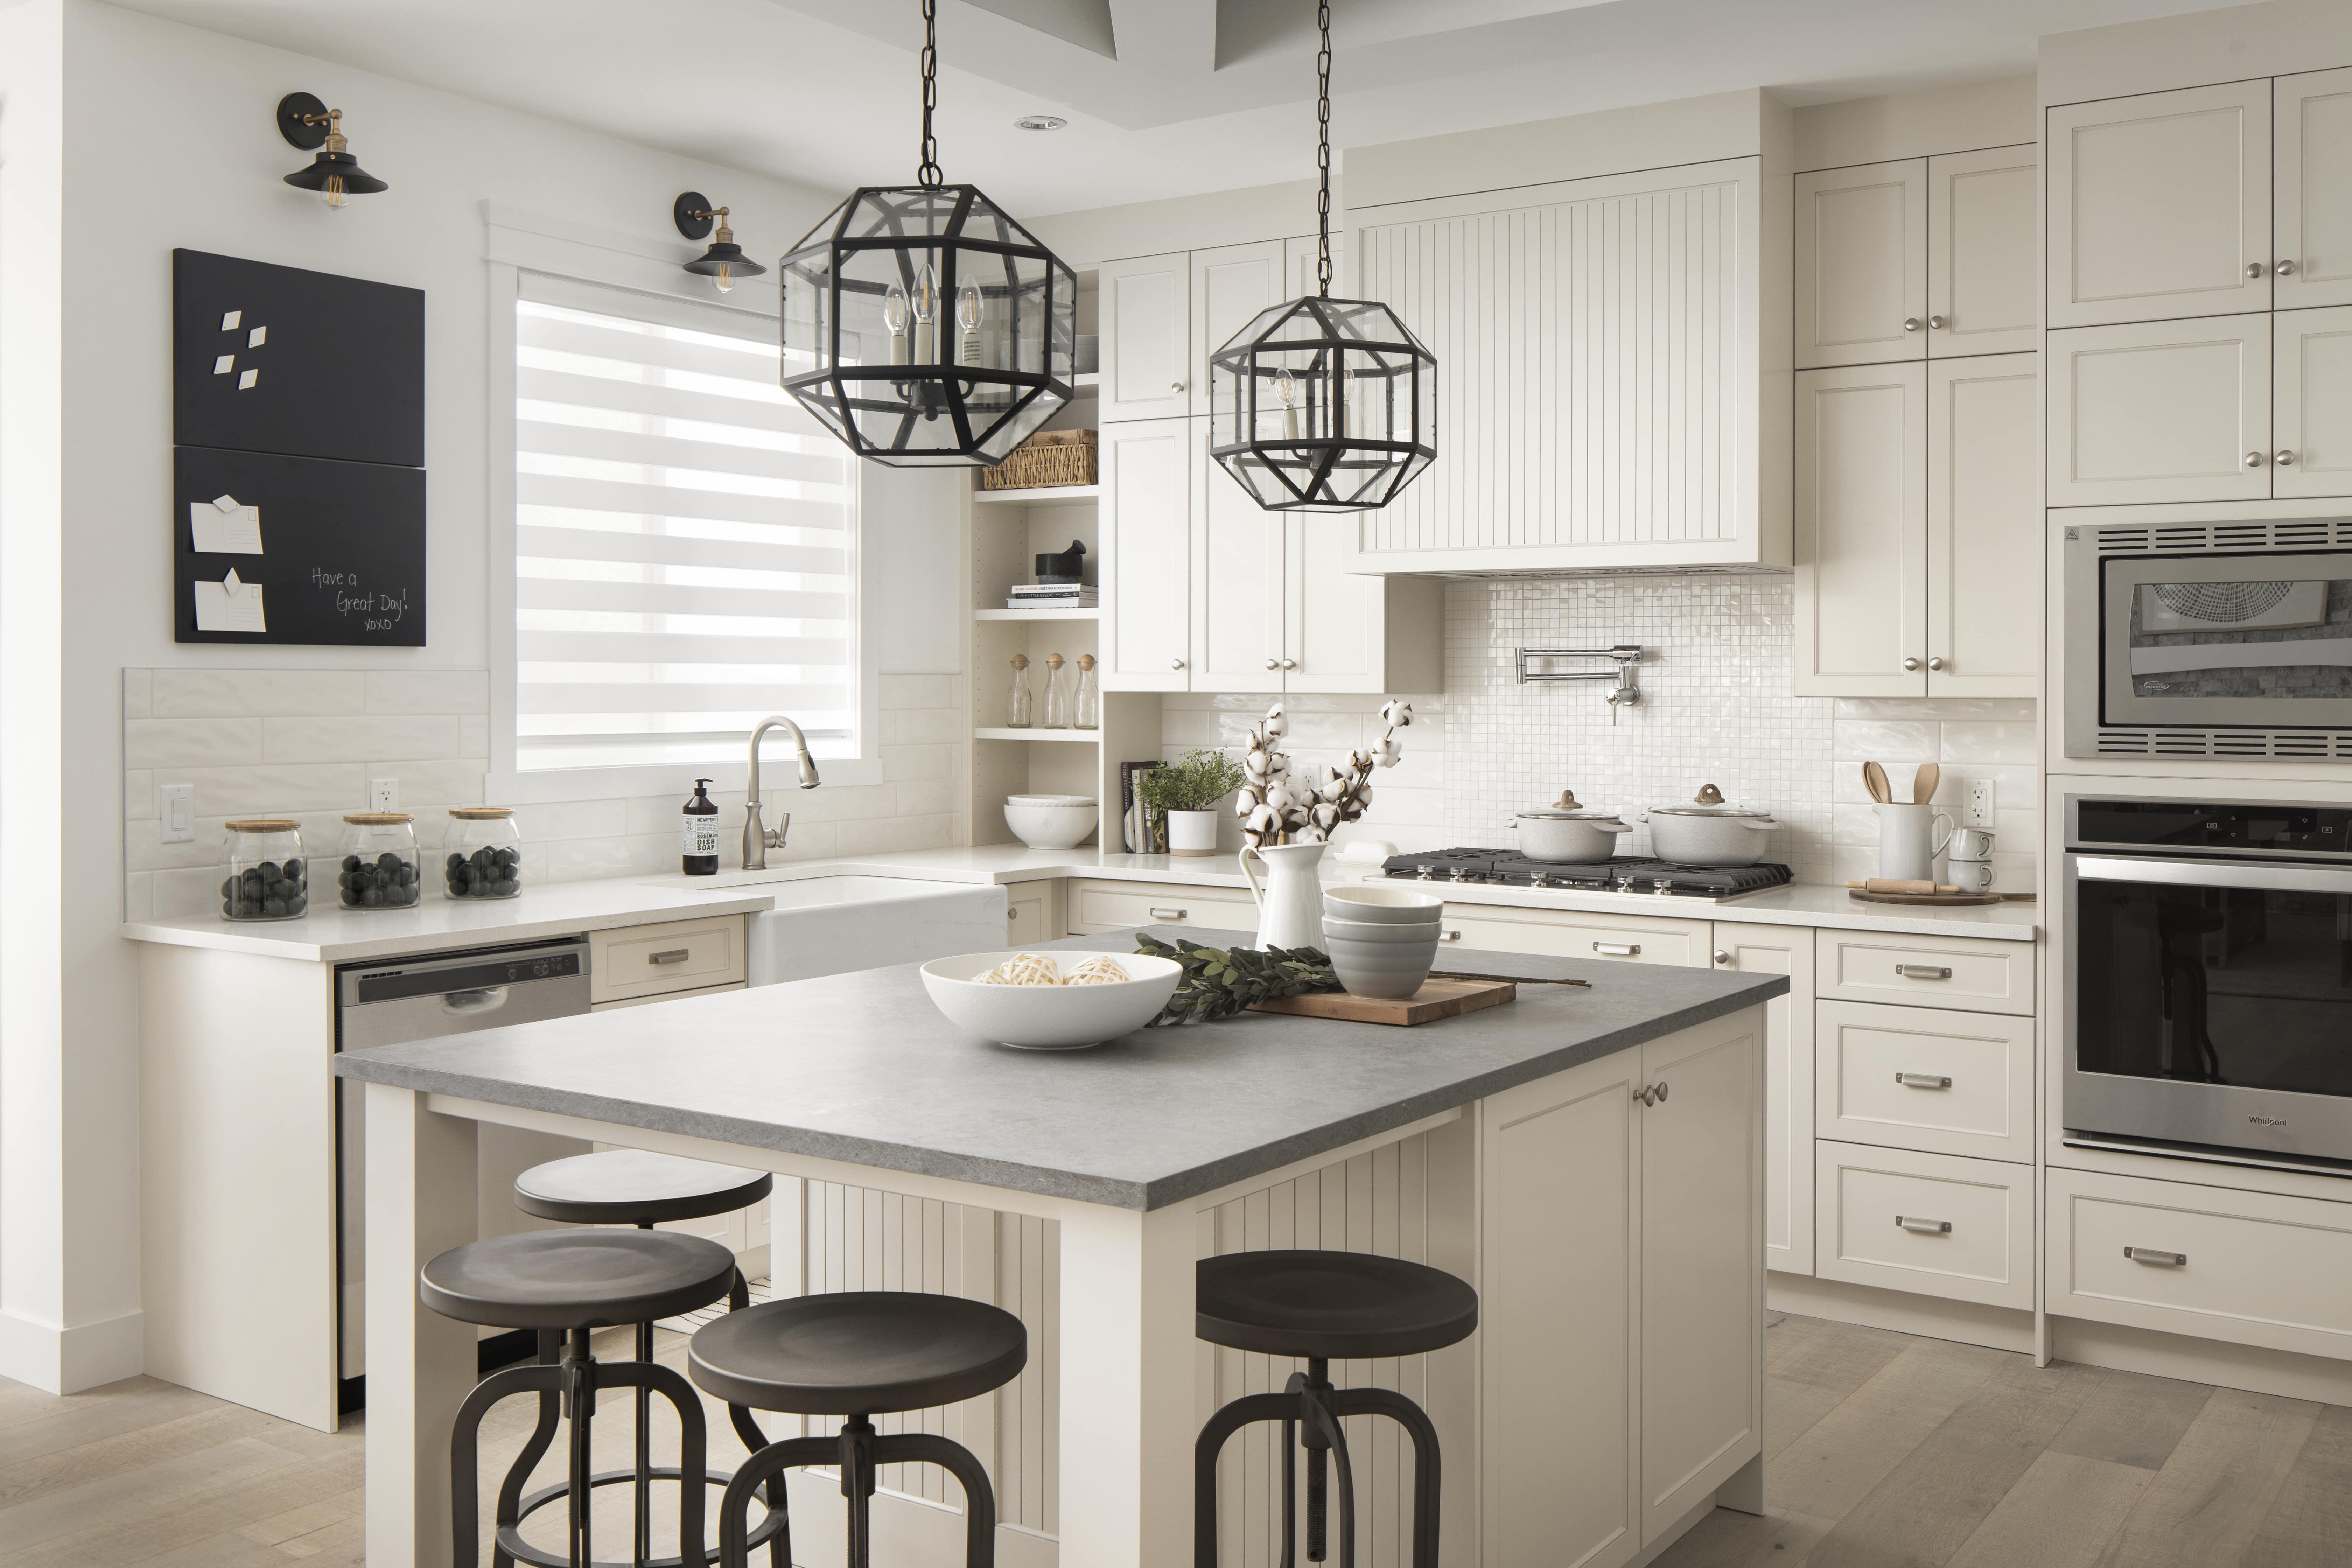 Luxuria_Homes_Builder_Calgary_Airdrie_Edmonton_Chestermere_Strathmore14-min